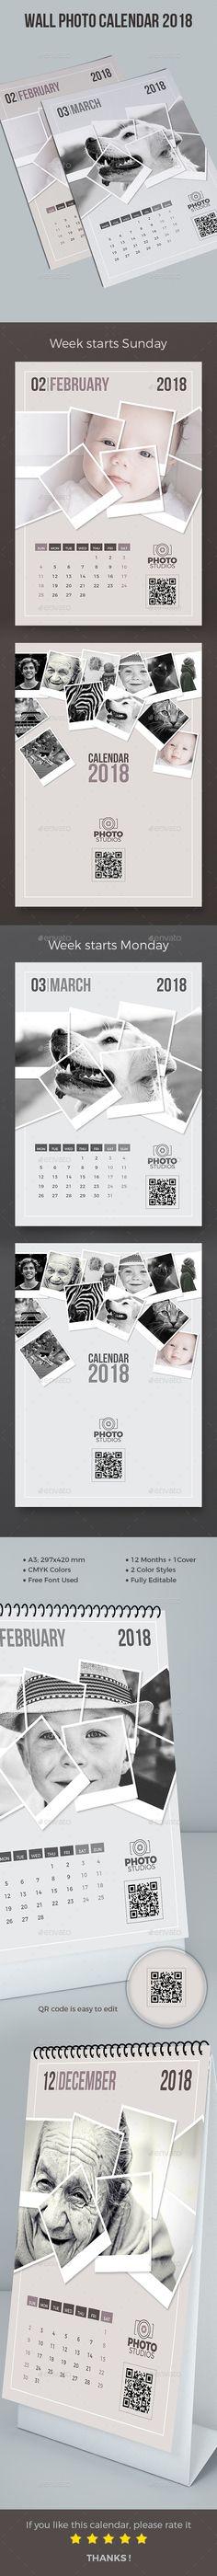 Wall Photo Calendar 2018